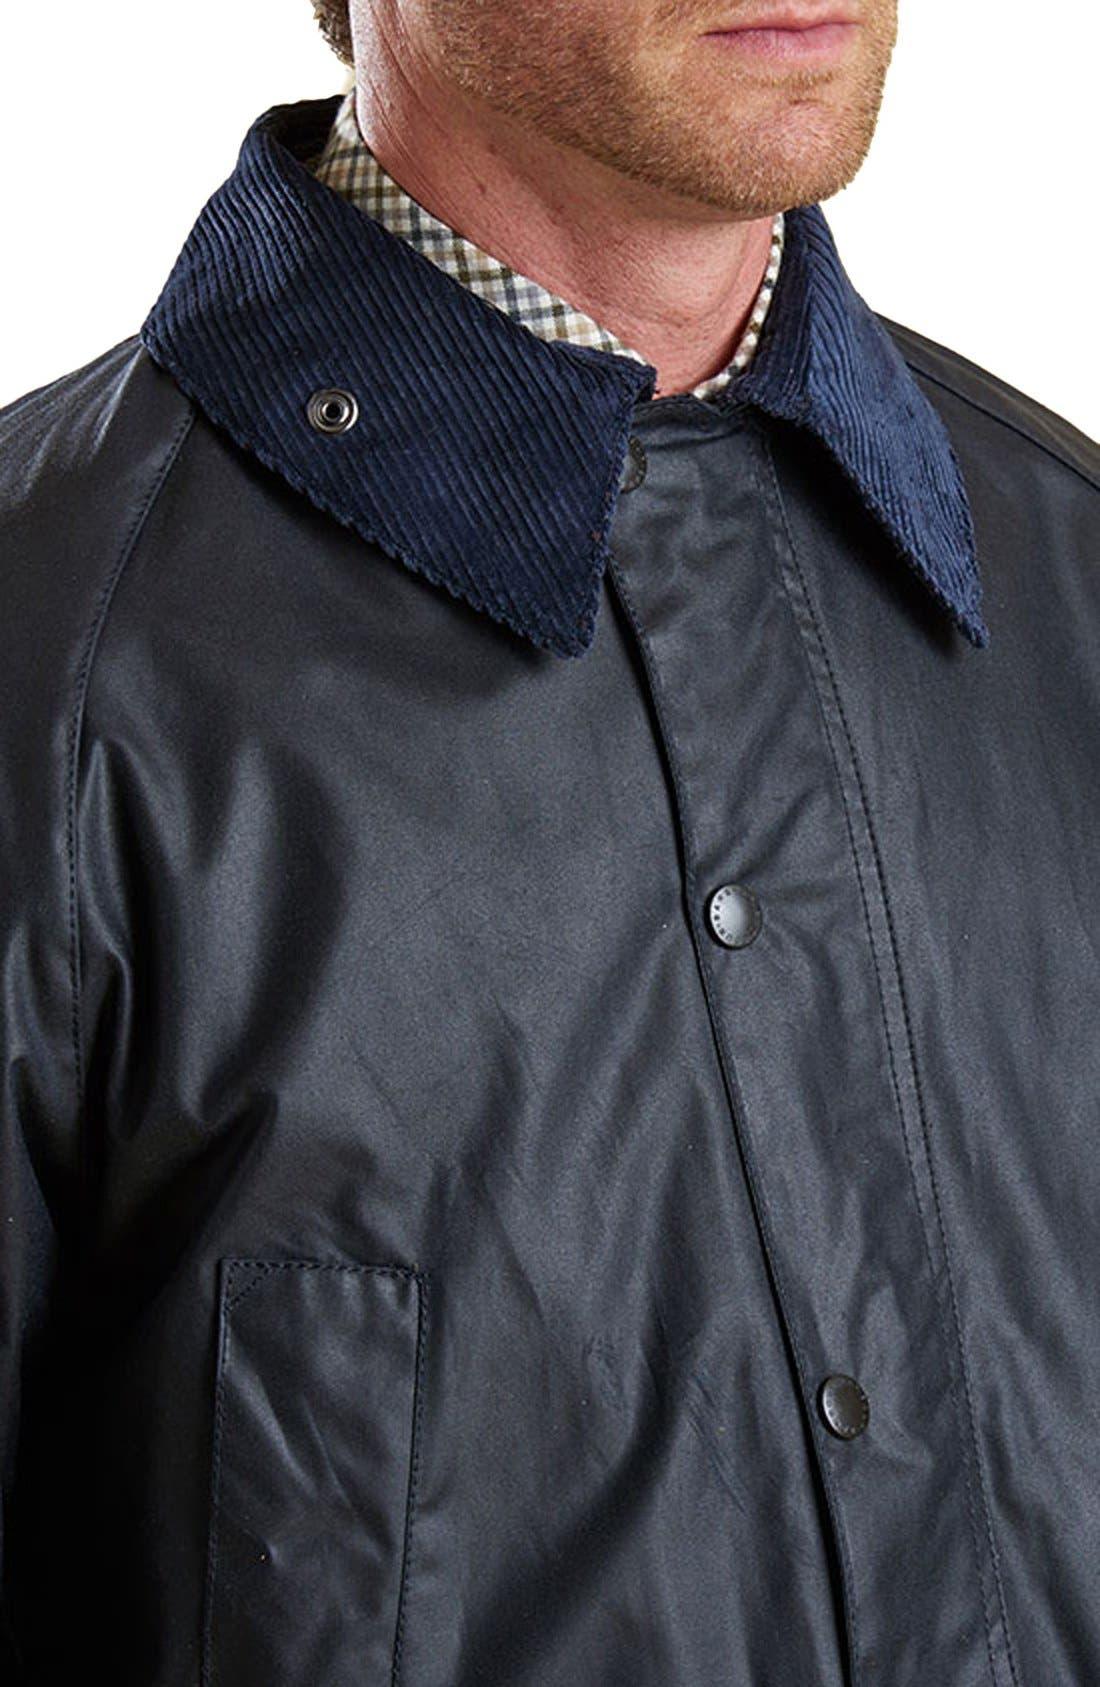 98dcf74f6b1 Men s Barbour Coats   Jackets